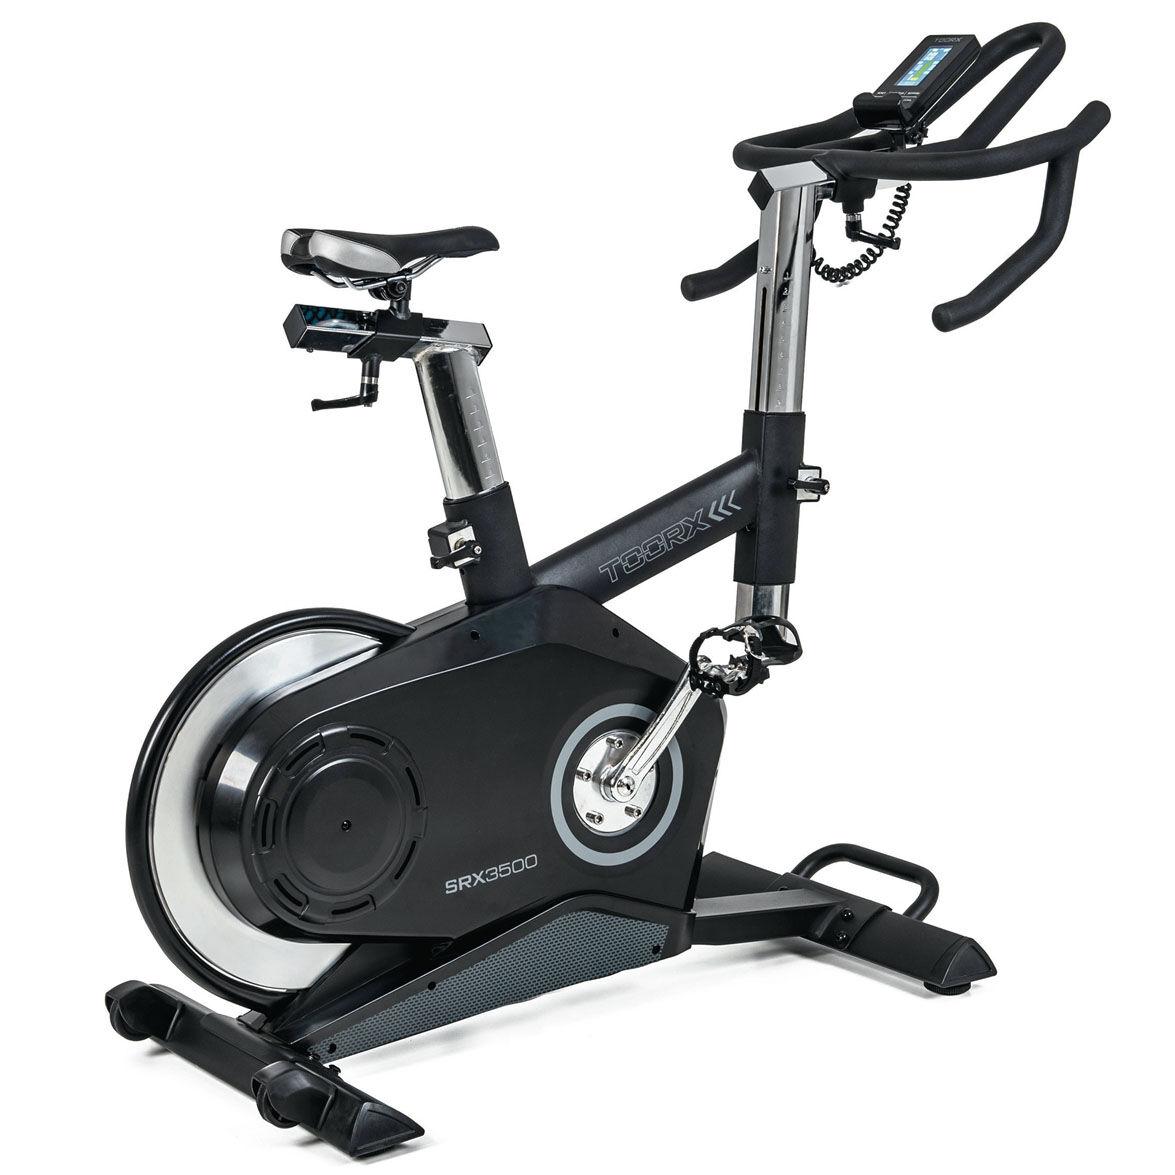 Toorx Srx 3500 Indoor Bike Spinningcykel-One